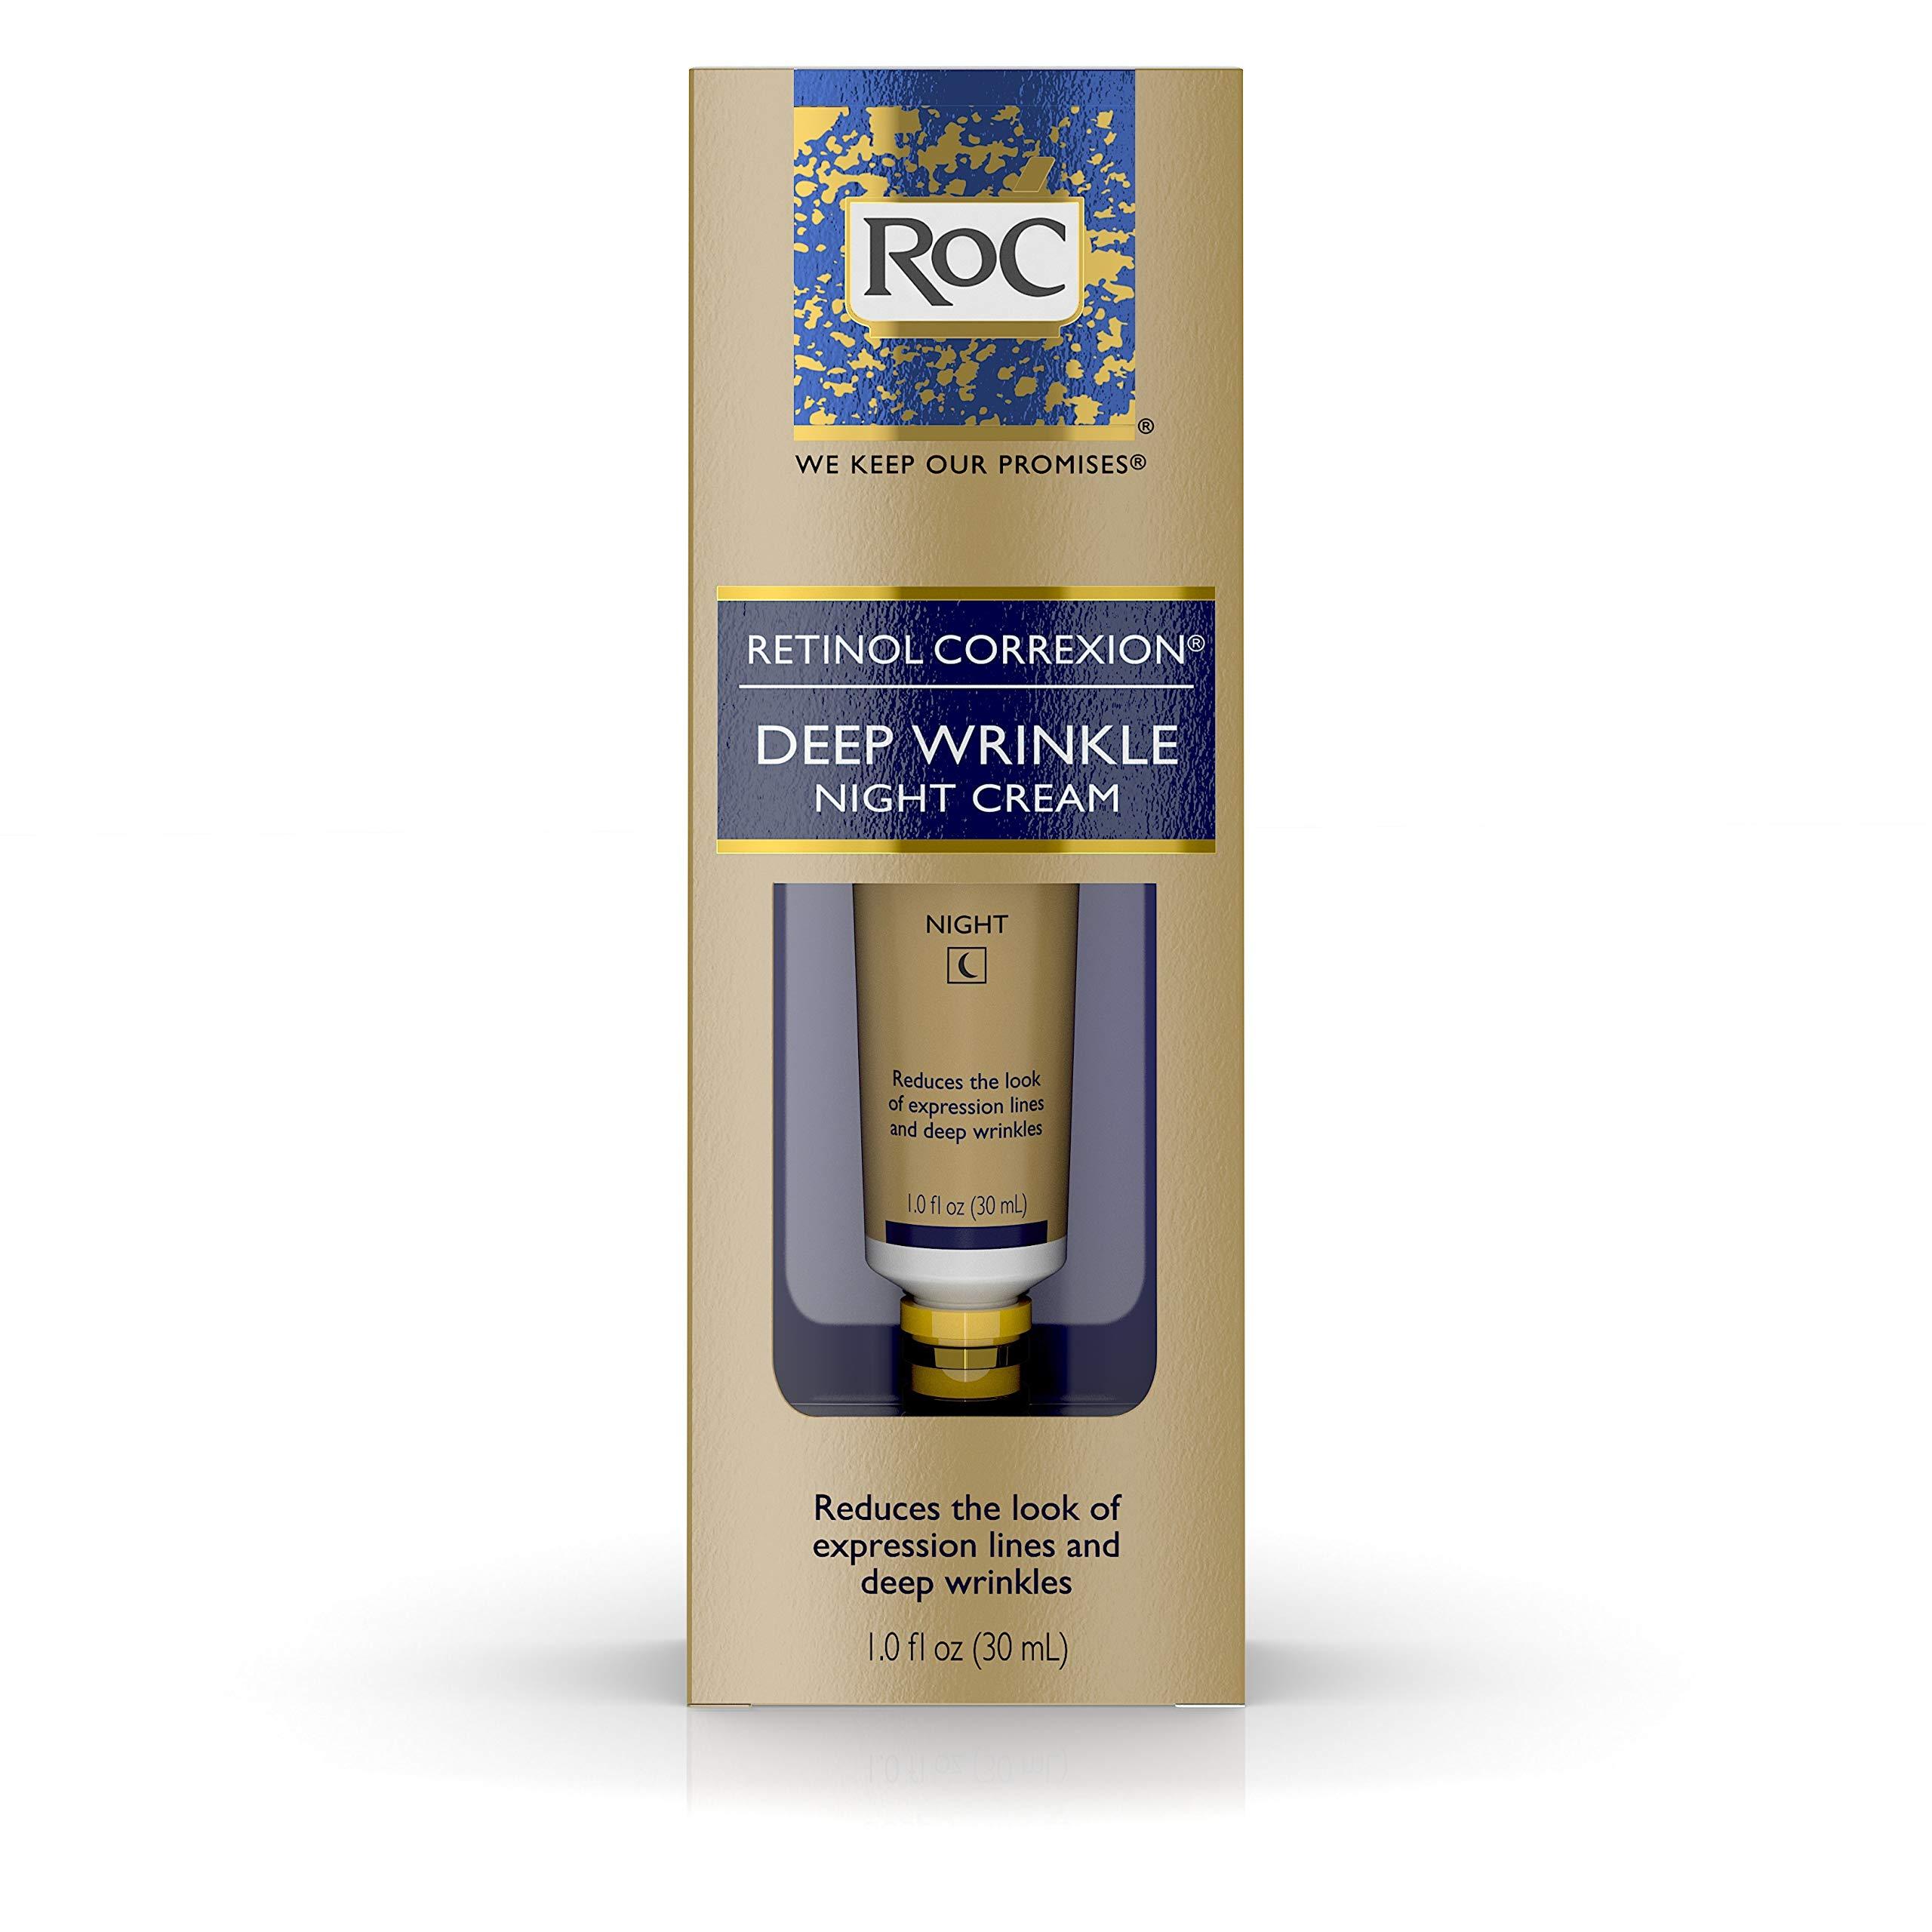 RoC Retinol Correxion Deep Wrinkle Anti-Aging Retinol Night Cream, Oil-Free and Non-Comedogenic, 1 Fl Oz by RoC